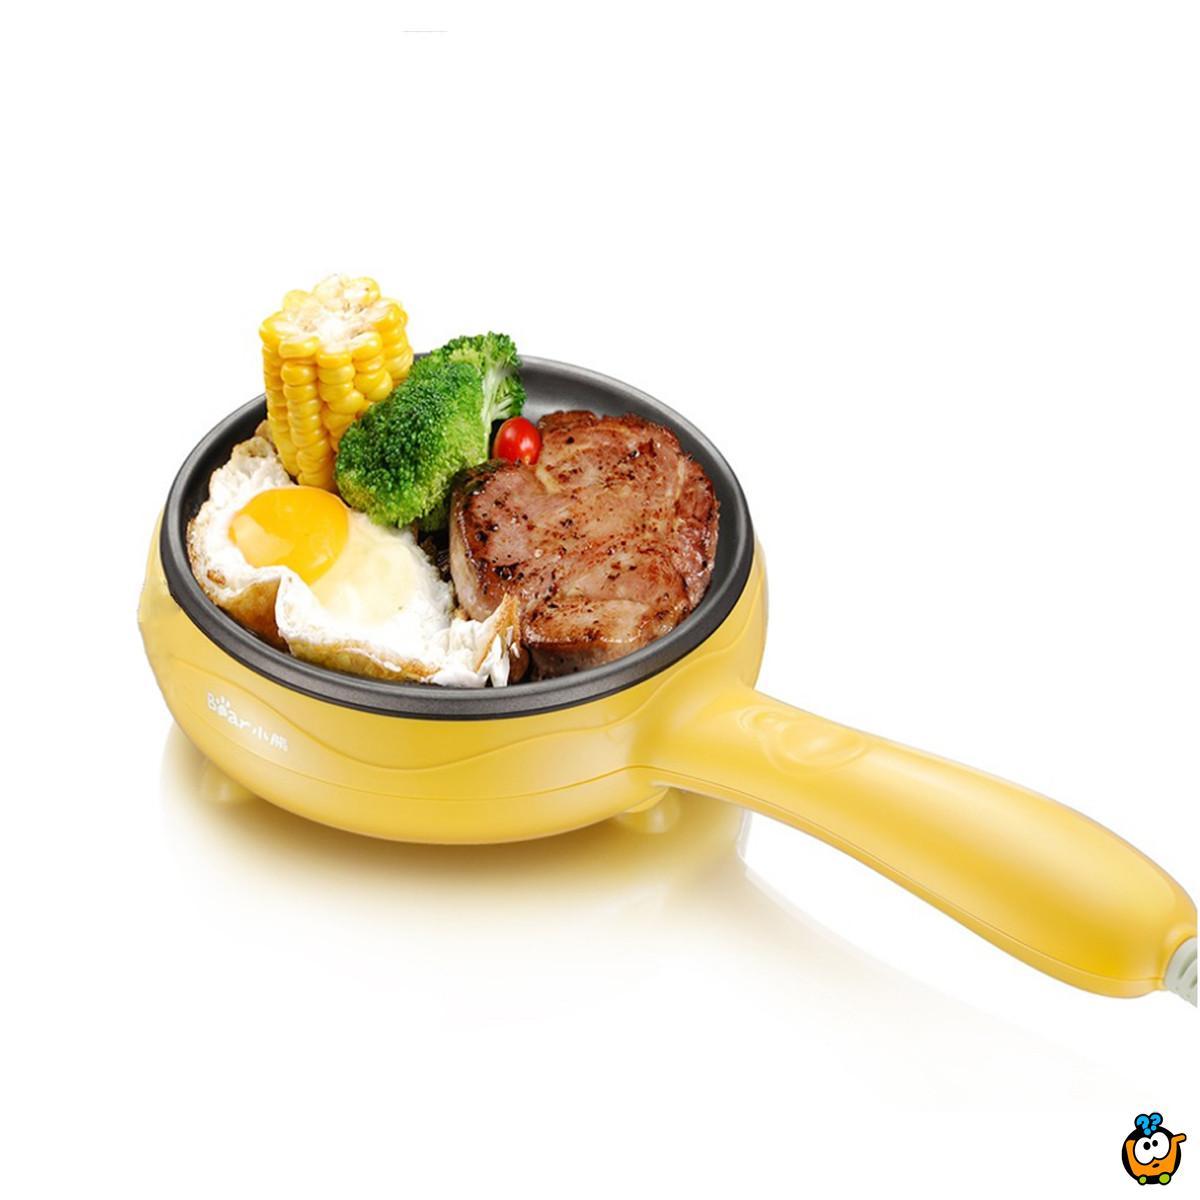 ElektričnI tiganj za kuvanje hrane